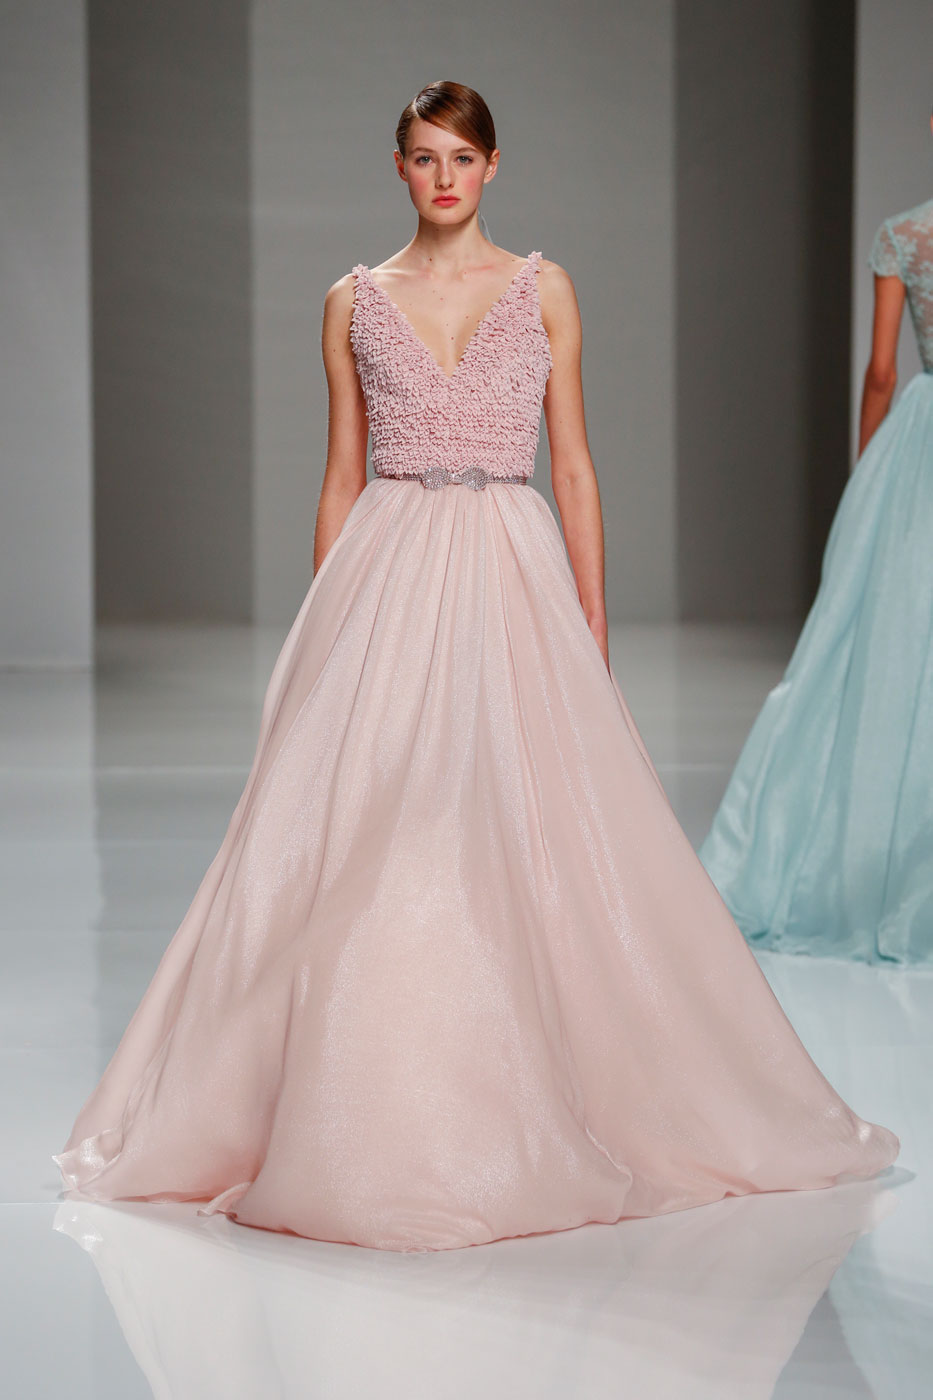 Georges-Hobeika-fashion-runway-show-haute-couture-paris-spring-2015-the-impression-43